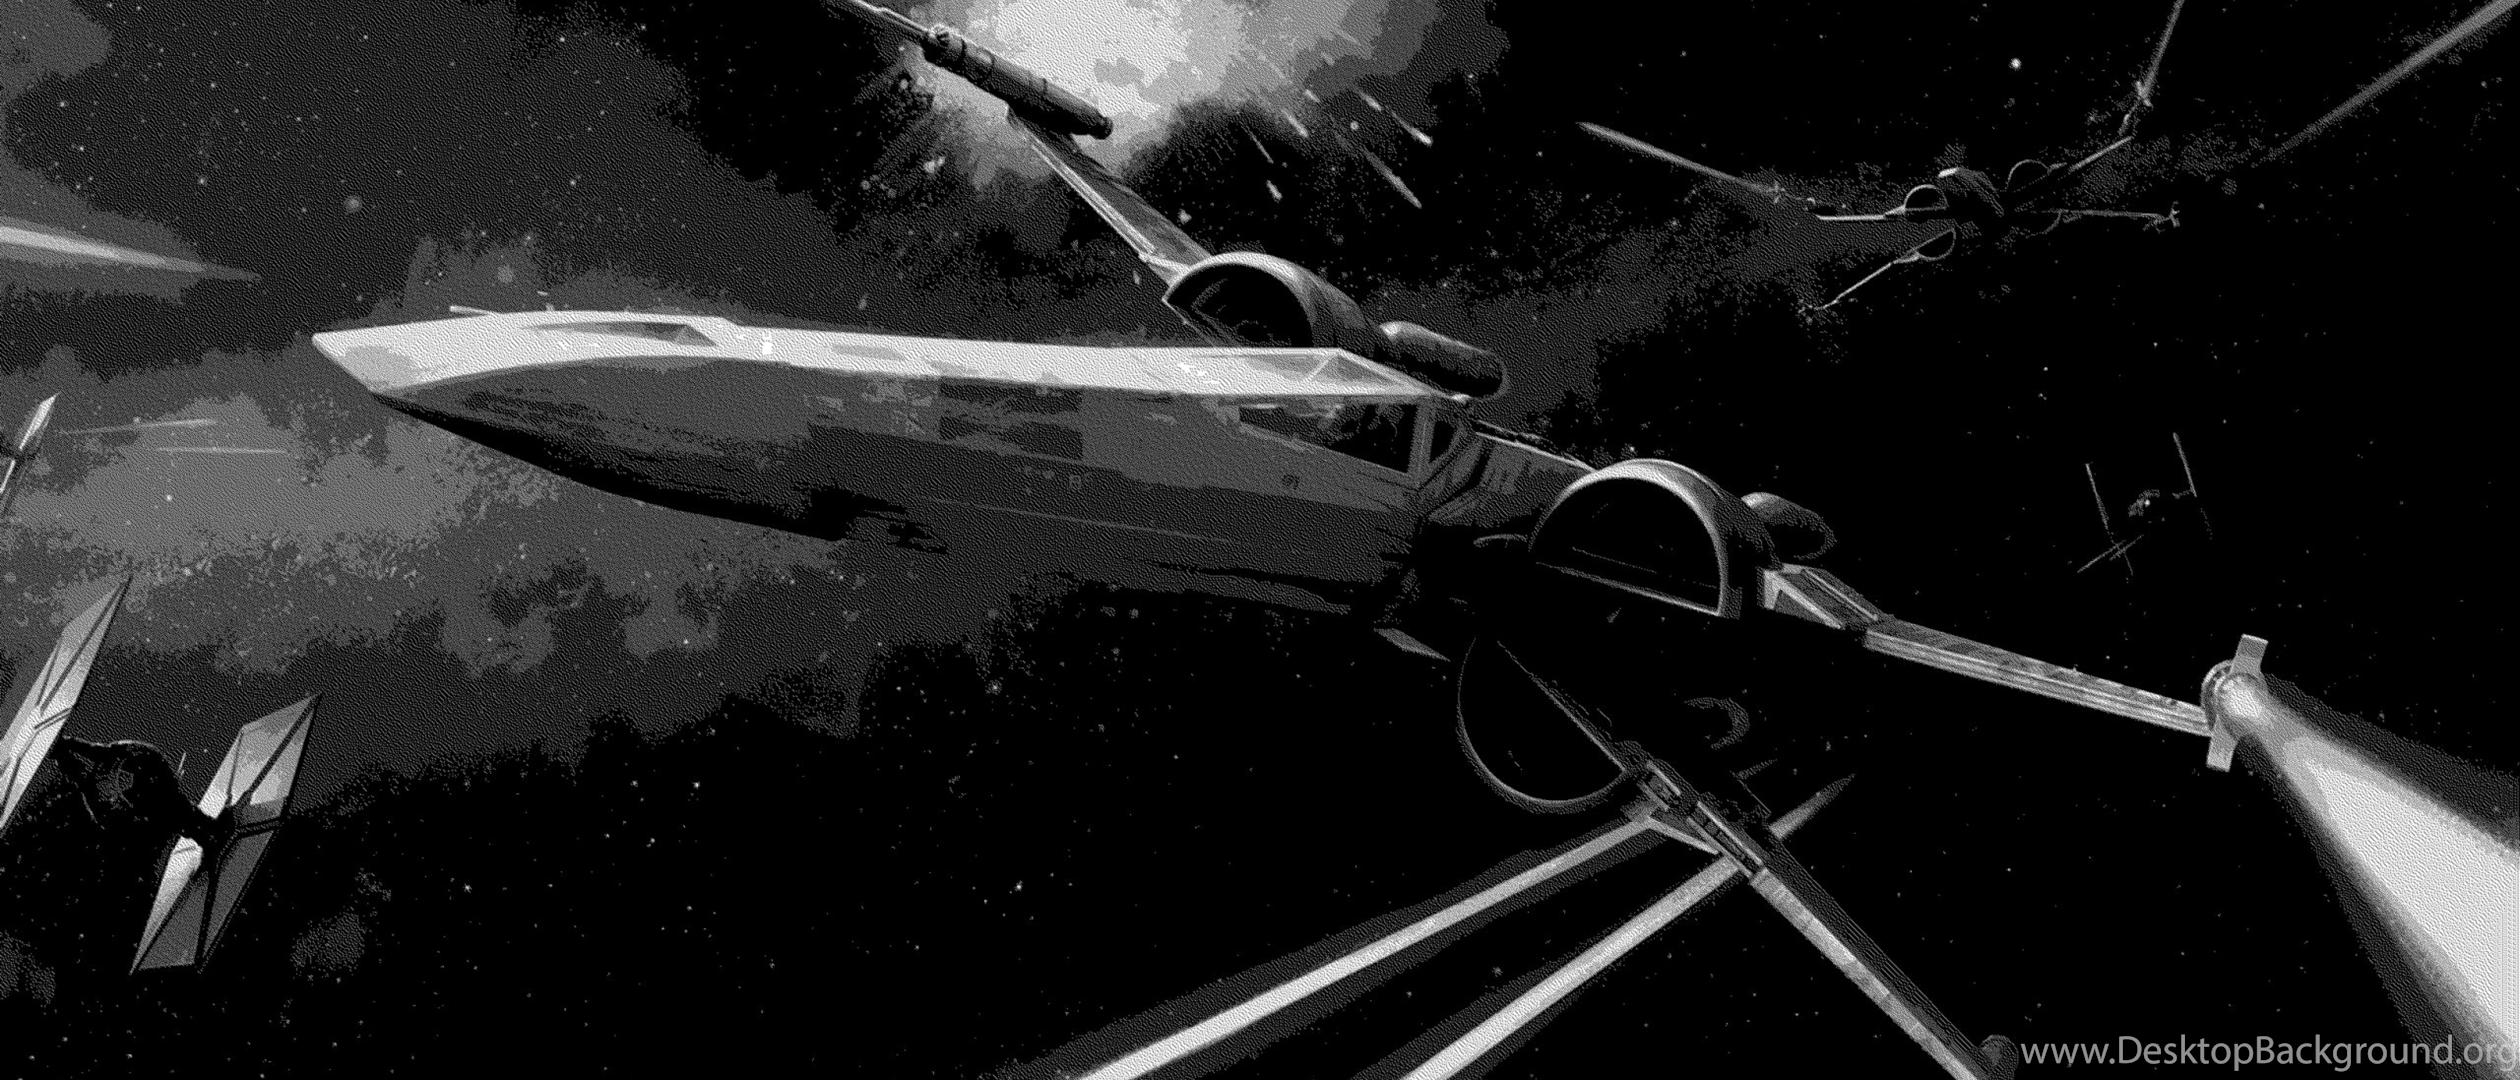 Space Spaceship X Wing Star Wars Wallpapers Hd Desktop Background